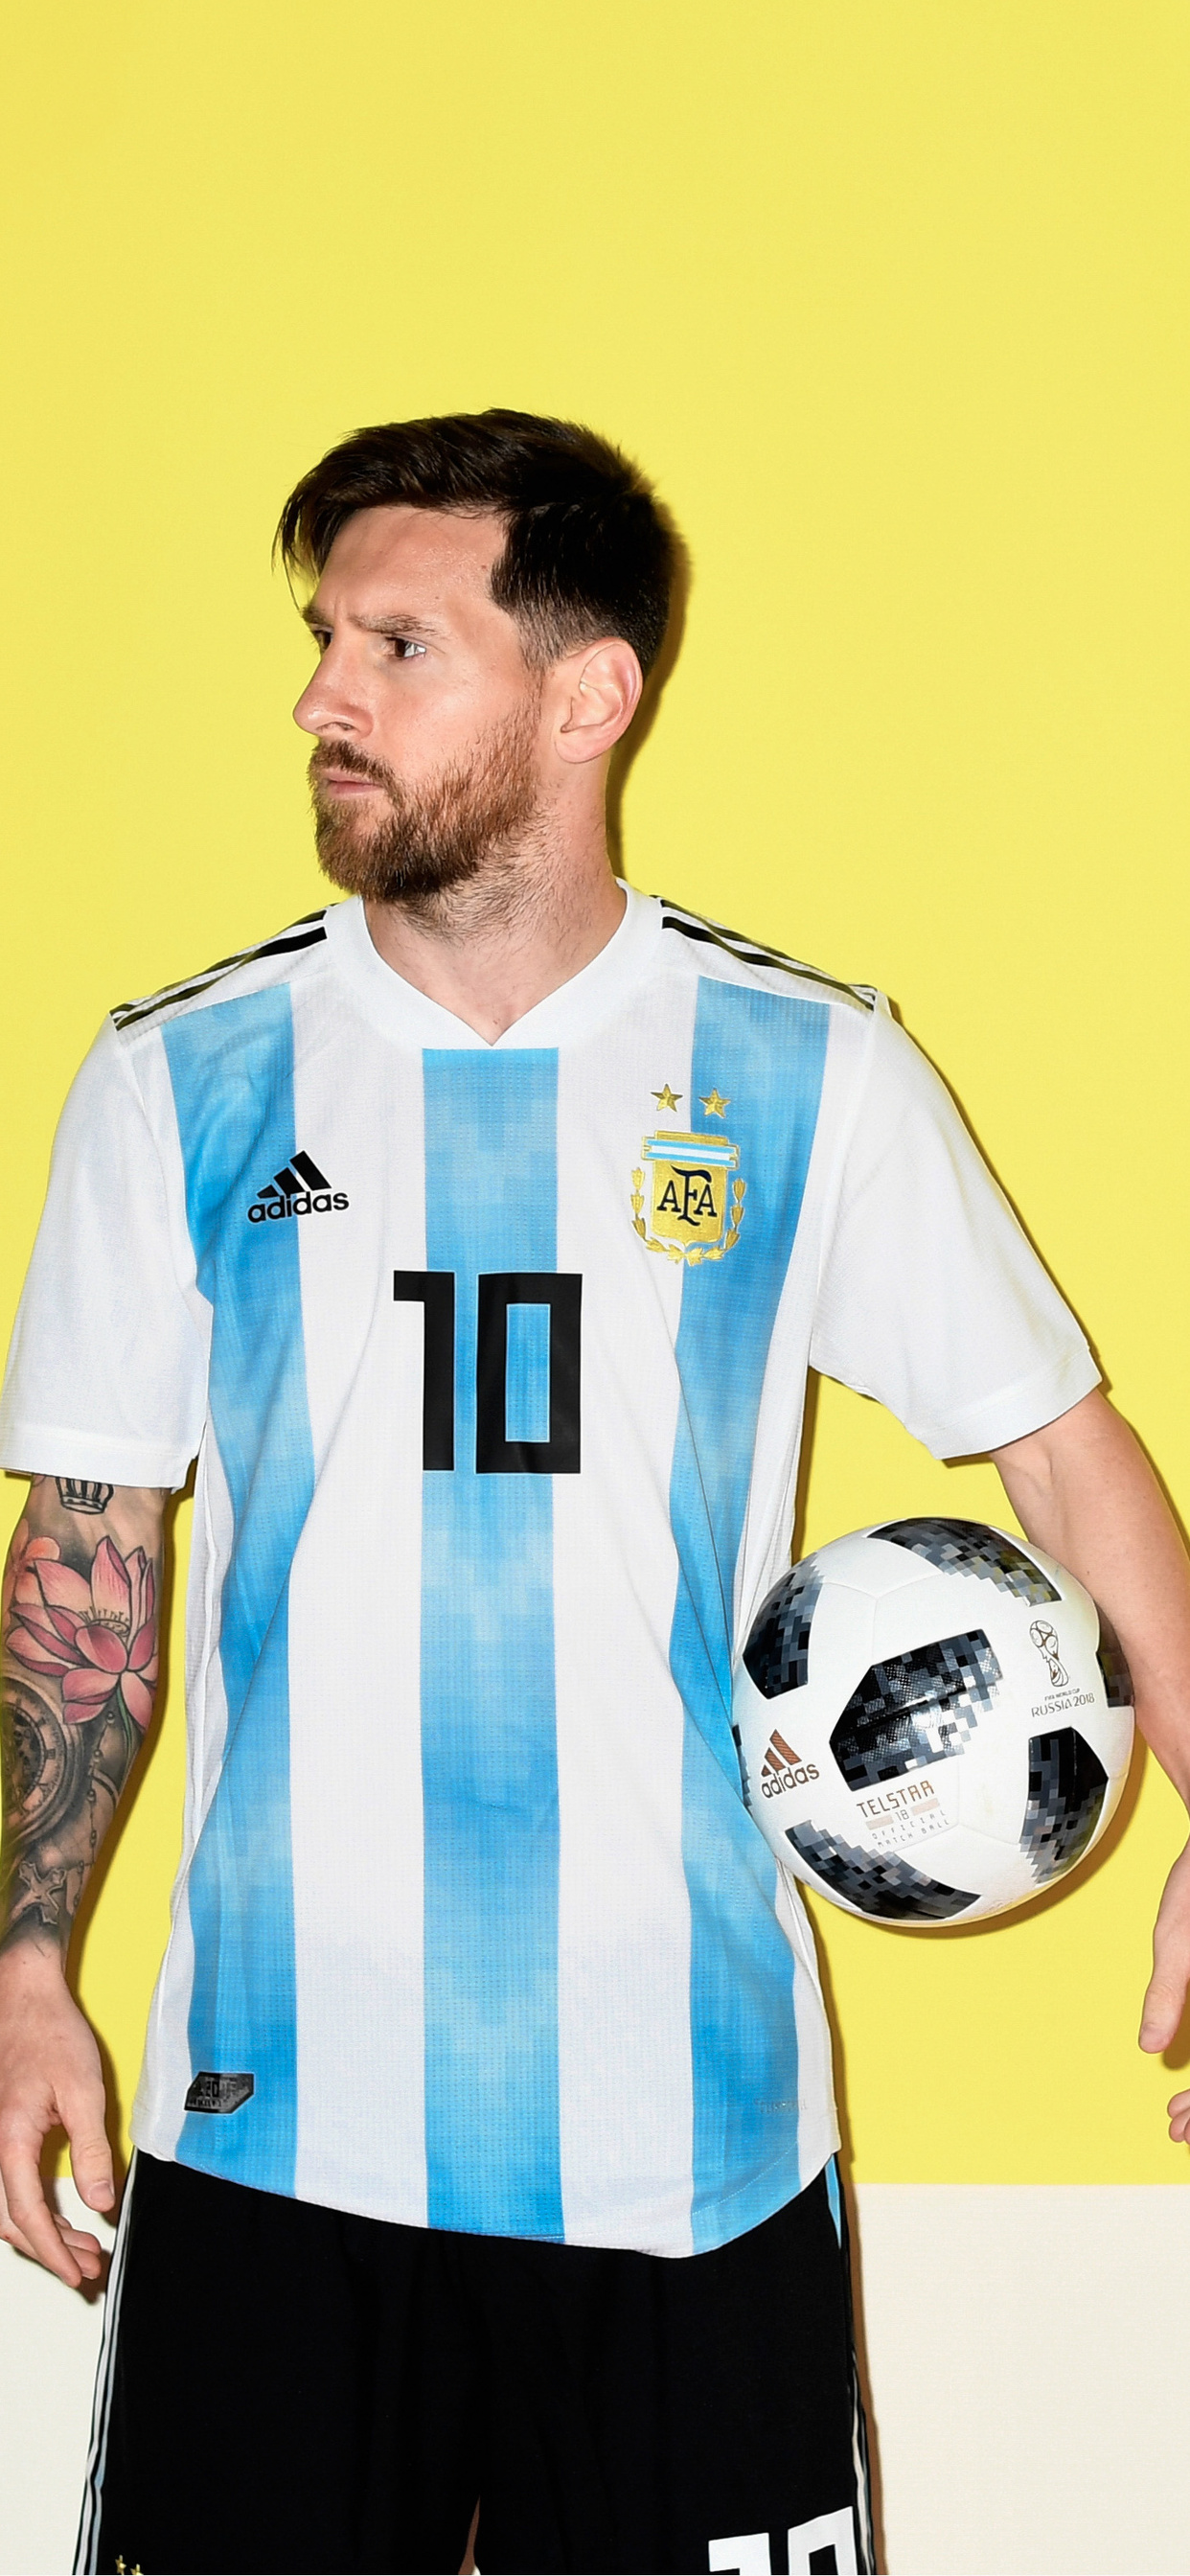 1242x2688 Lionel Messi Argentina Portrait 2018 Iphone Xs Max Hd 4k